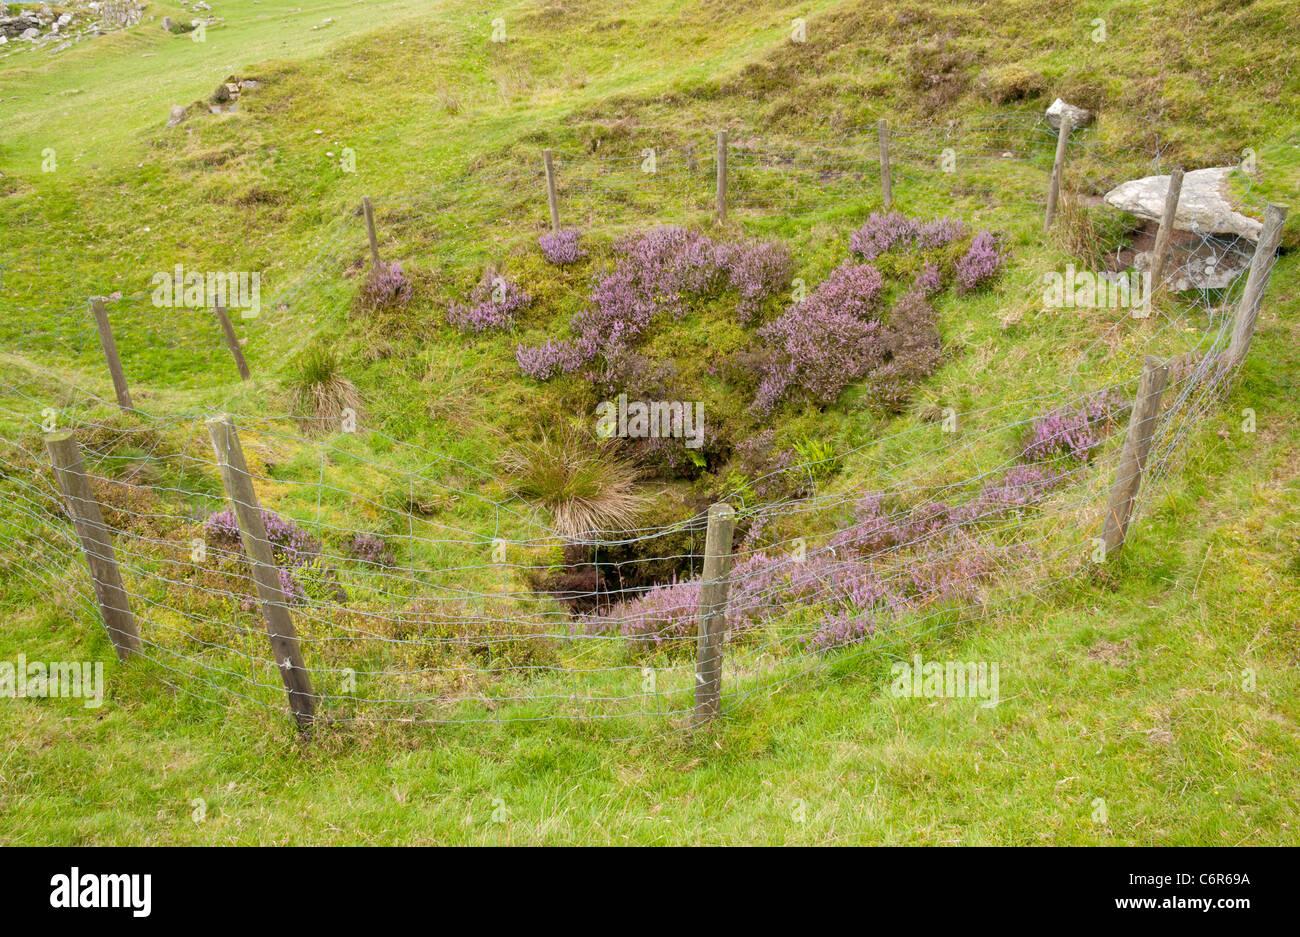 Fenced off mine shaft at Eylesbarrow disused tin mine, Dartmoor, Devon UK - Stock Image